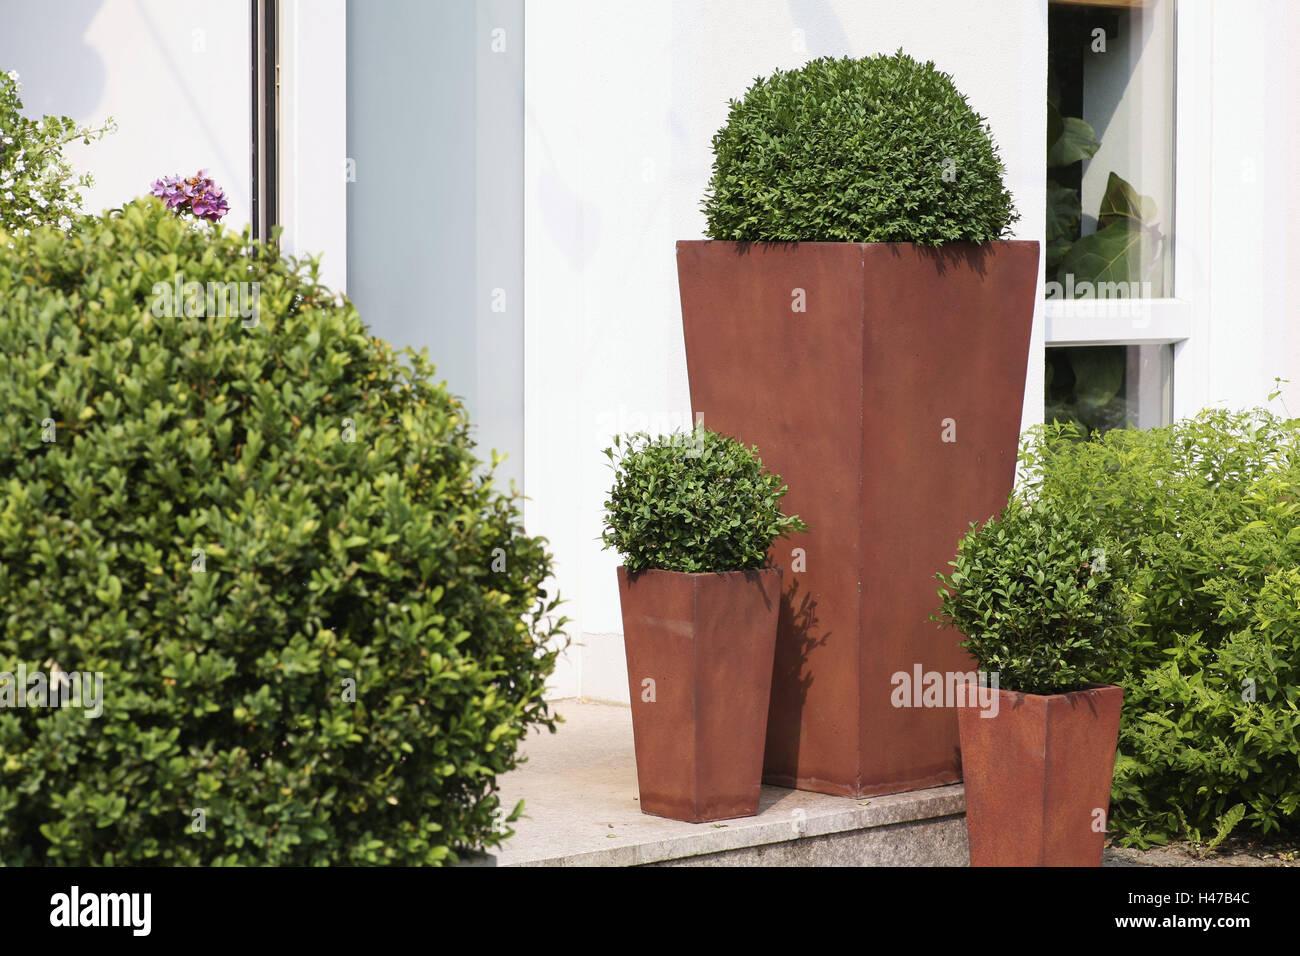 Boxwoods, different sizes, - Stock Image